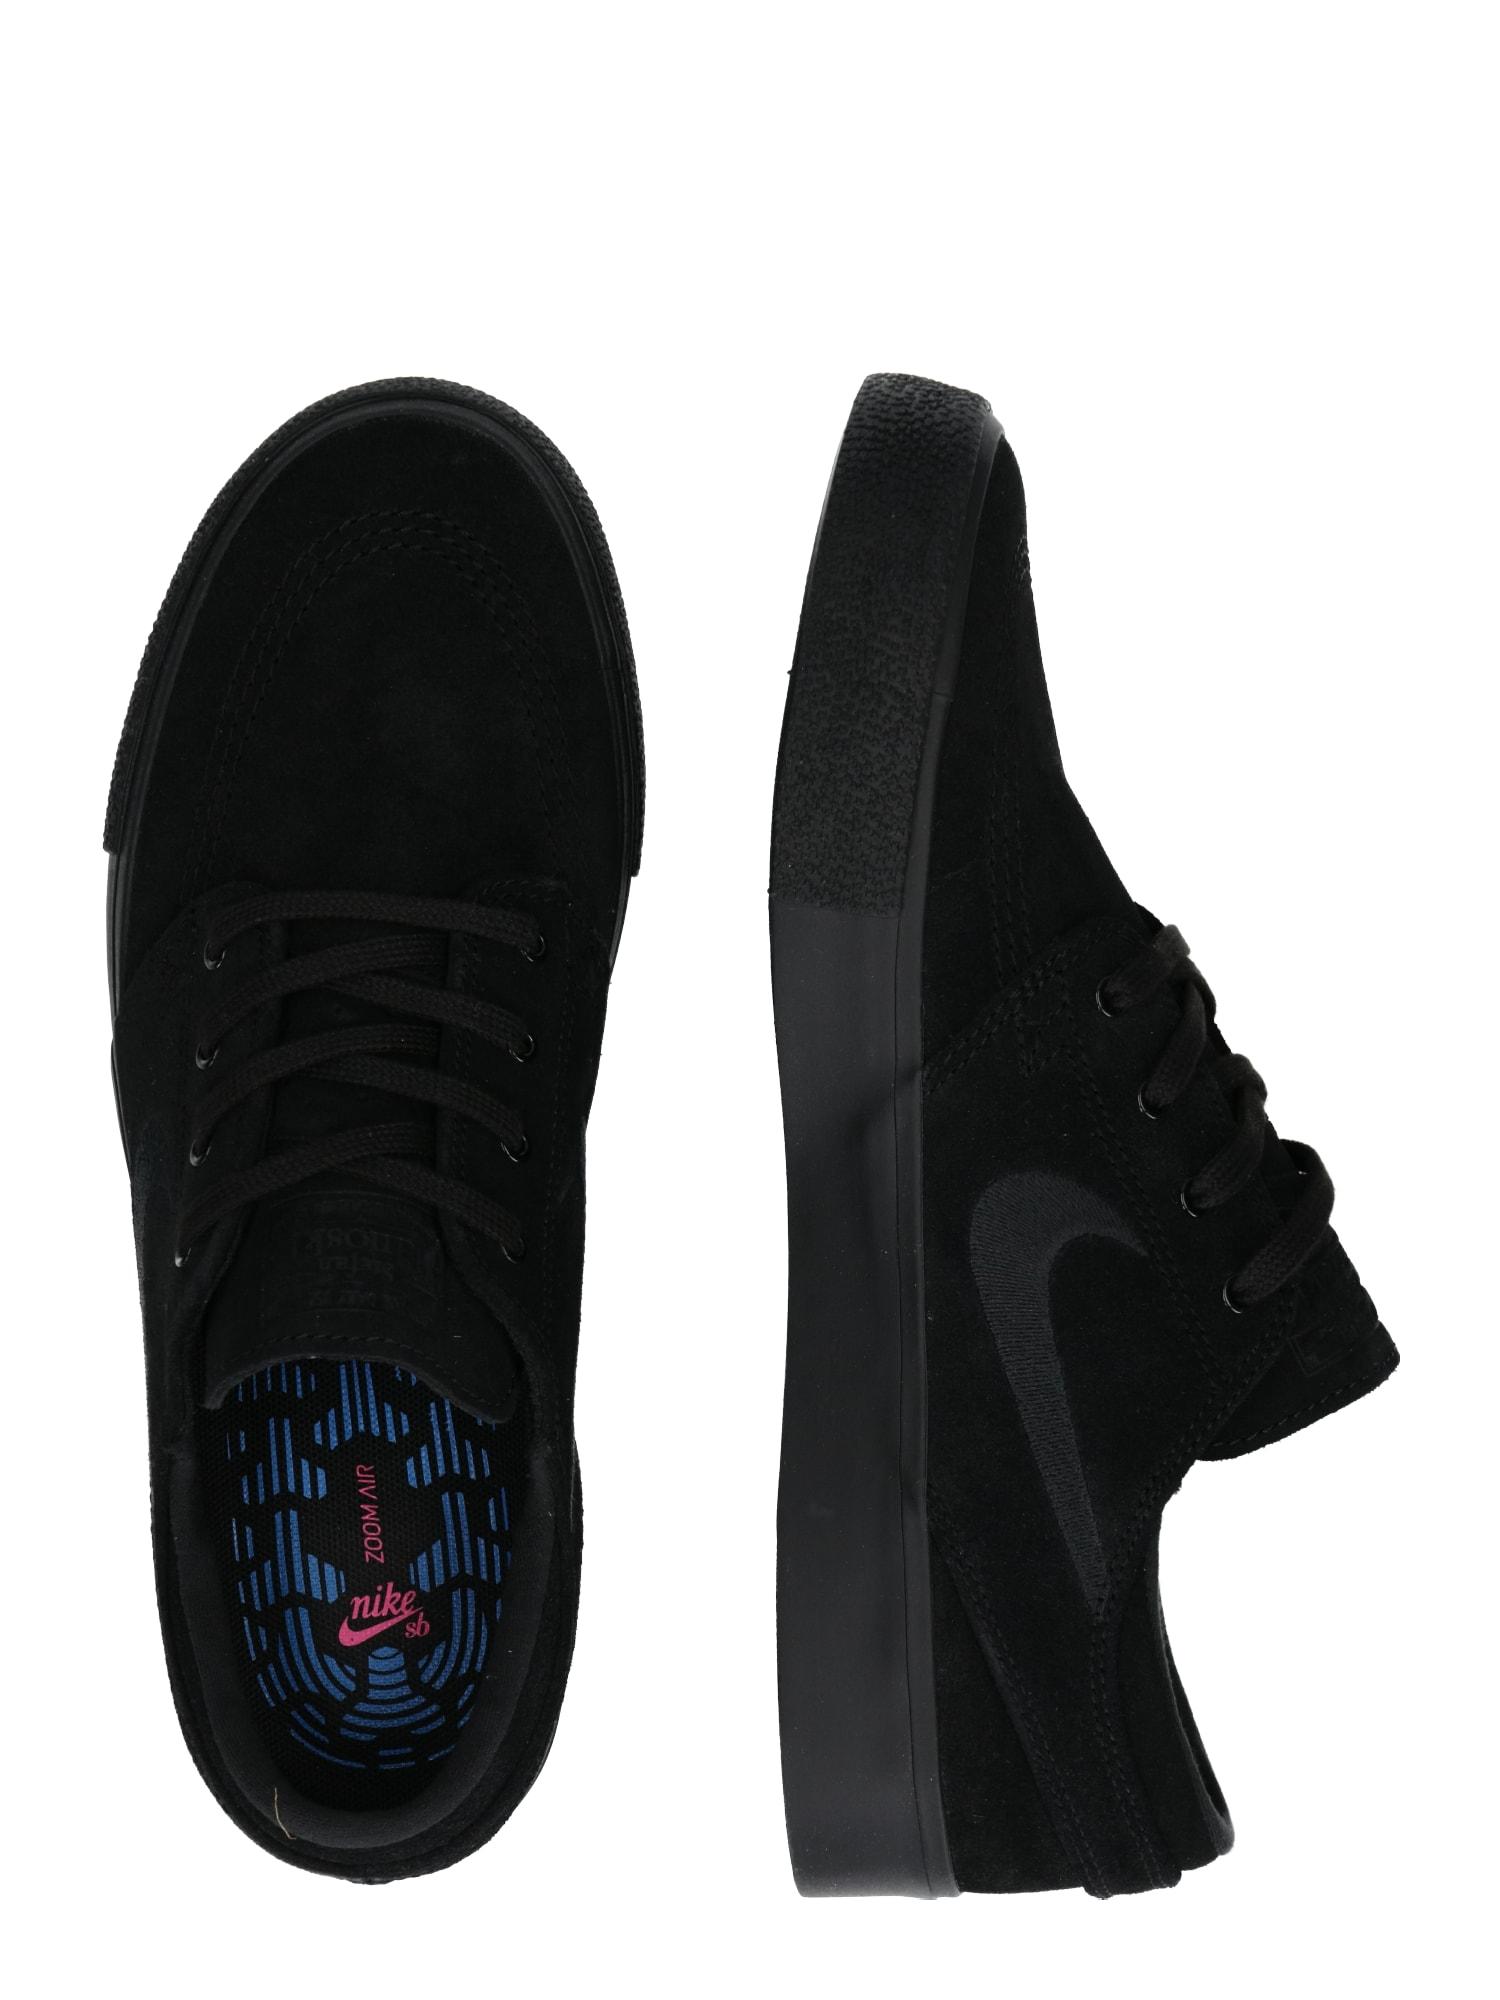 Nike SB, Damen Sneakers laag  Janoski RM, zwart